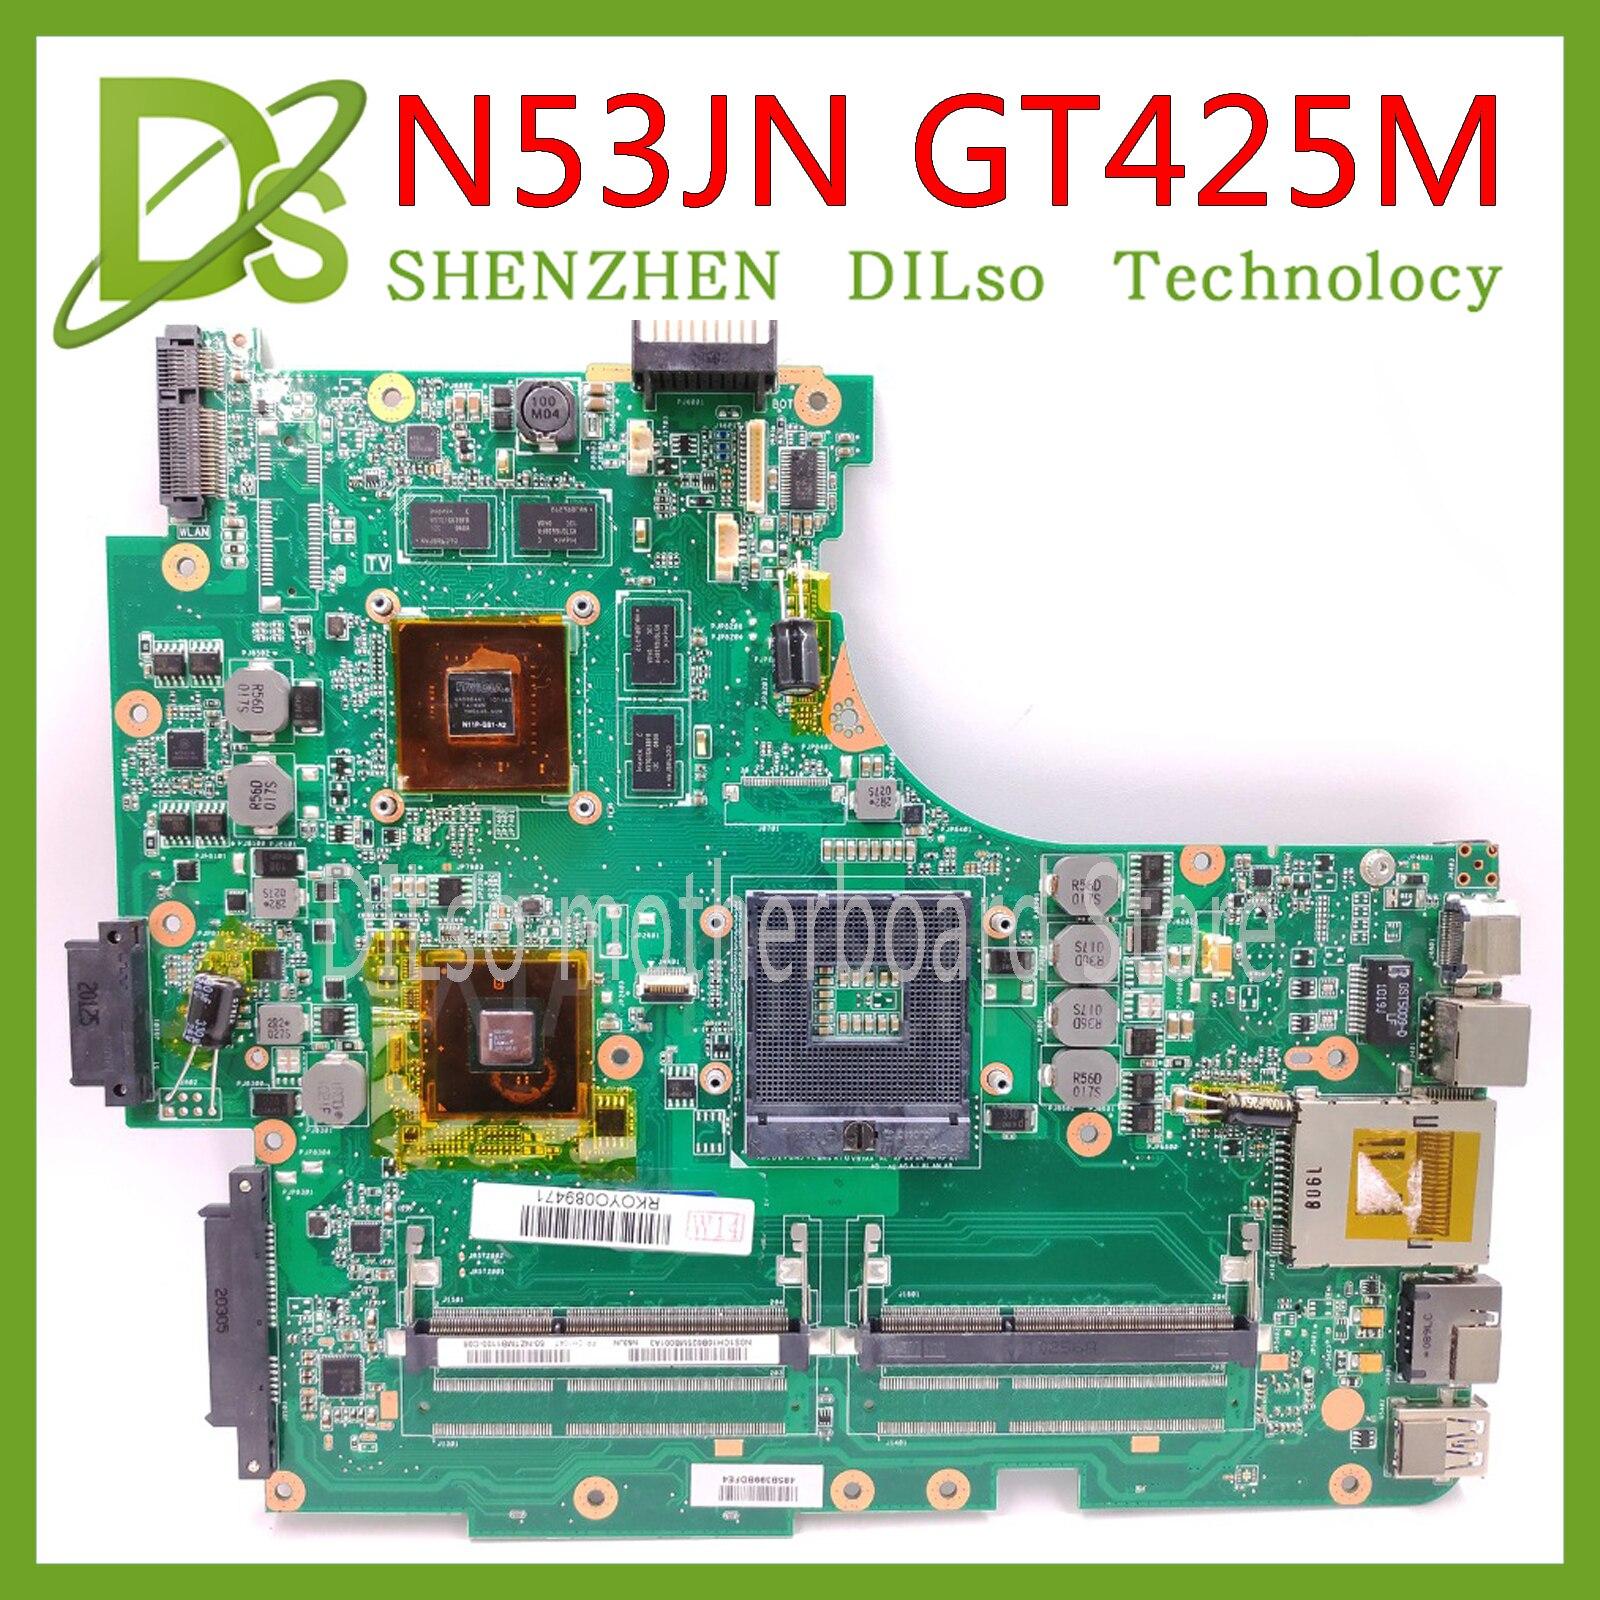 Mainboard KEFU N53JN para ASUS N53JQ N53J N53JN N53JF placa madre portátil GT425M prueba trabajo 100% original